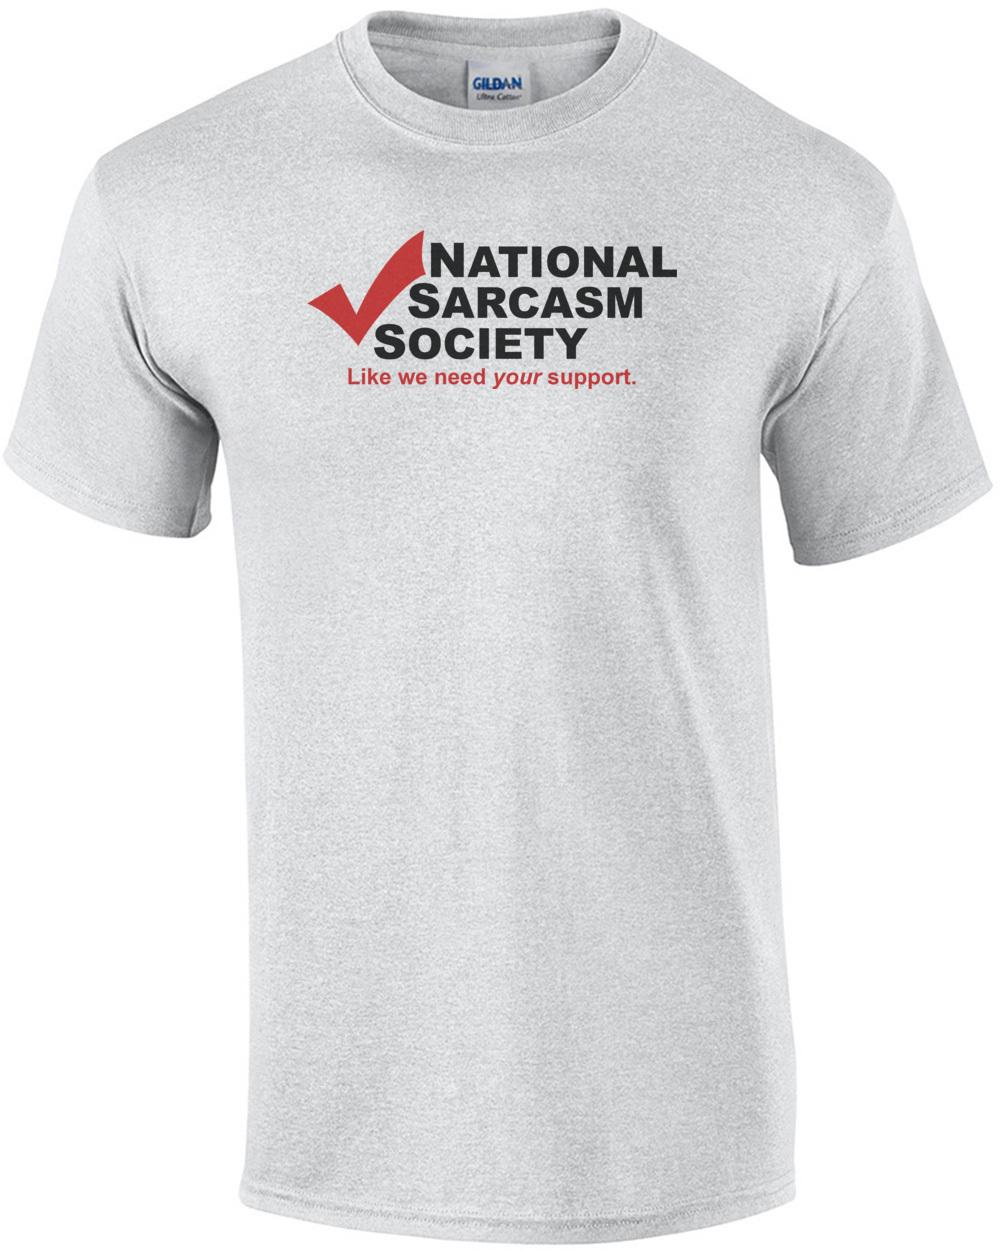 f1d4724af856 national-sarcasm-society-tshirt-mens-regular-ash.jpg